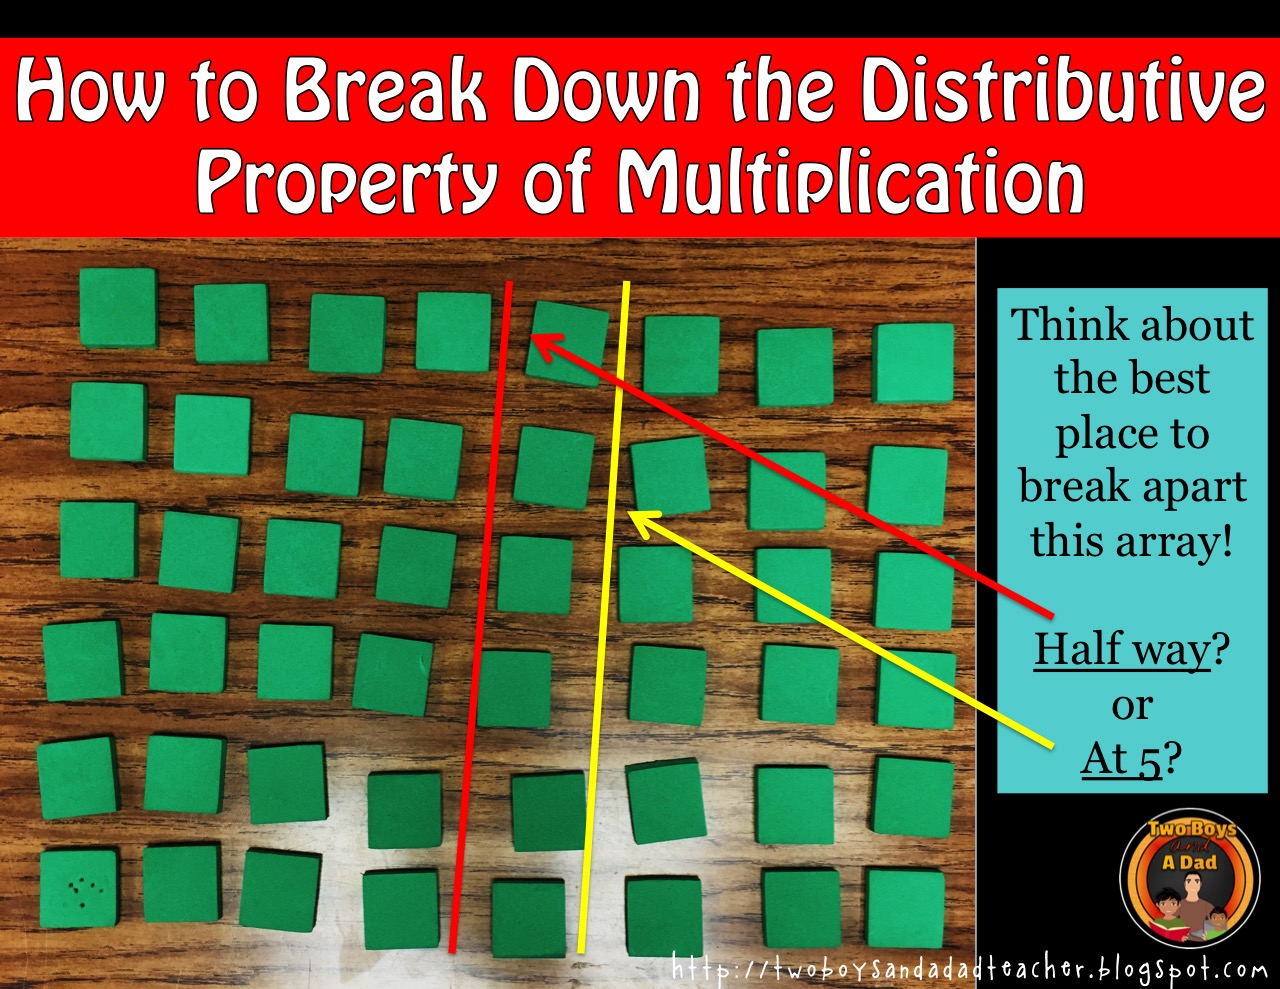 break apart the Distributive Property of Multiplication